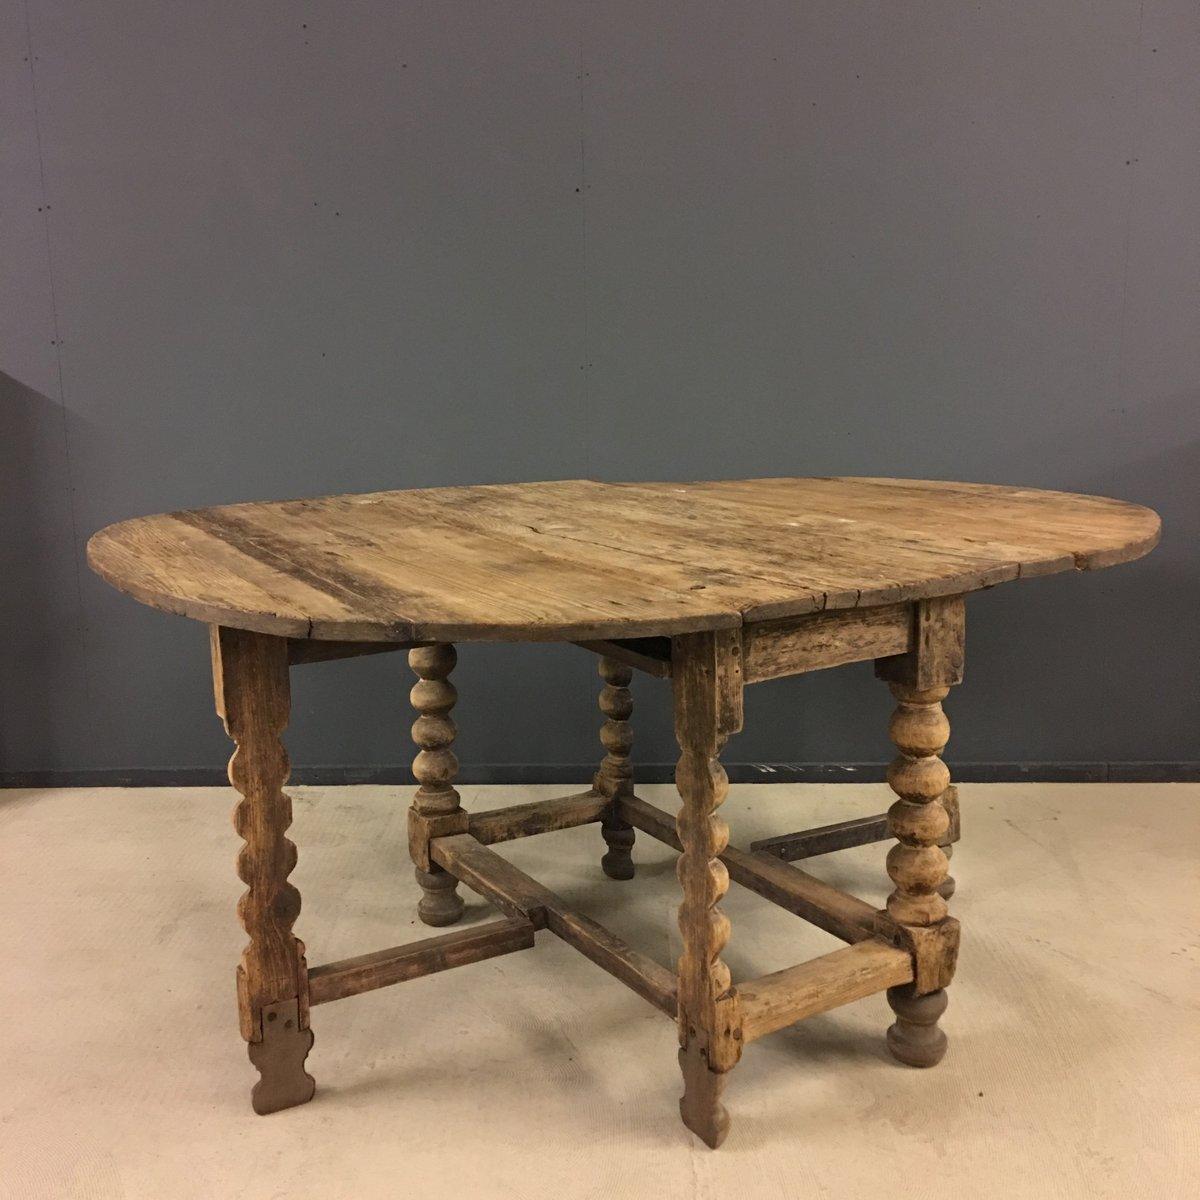 Swedish Oval Pine Gateleg Table 18th Century for sale at Pamono